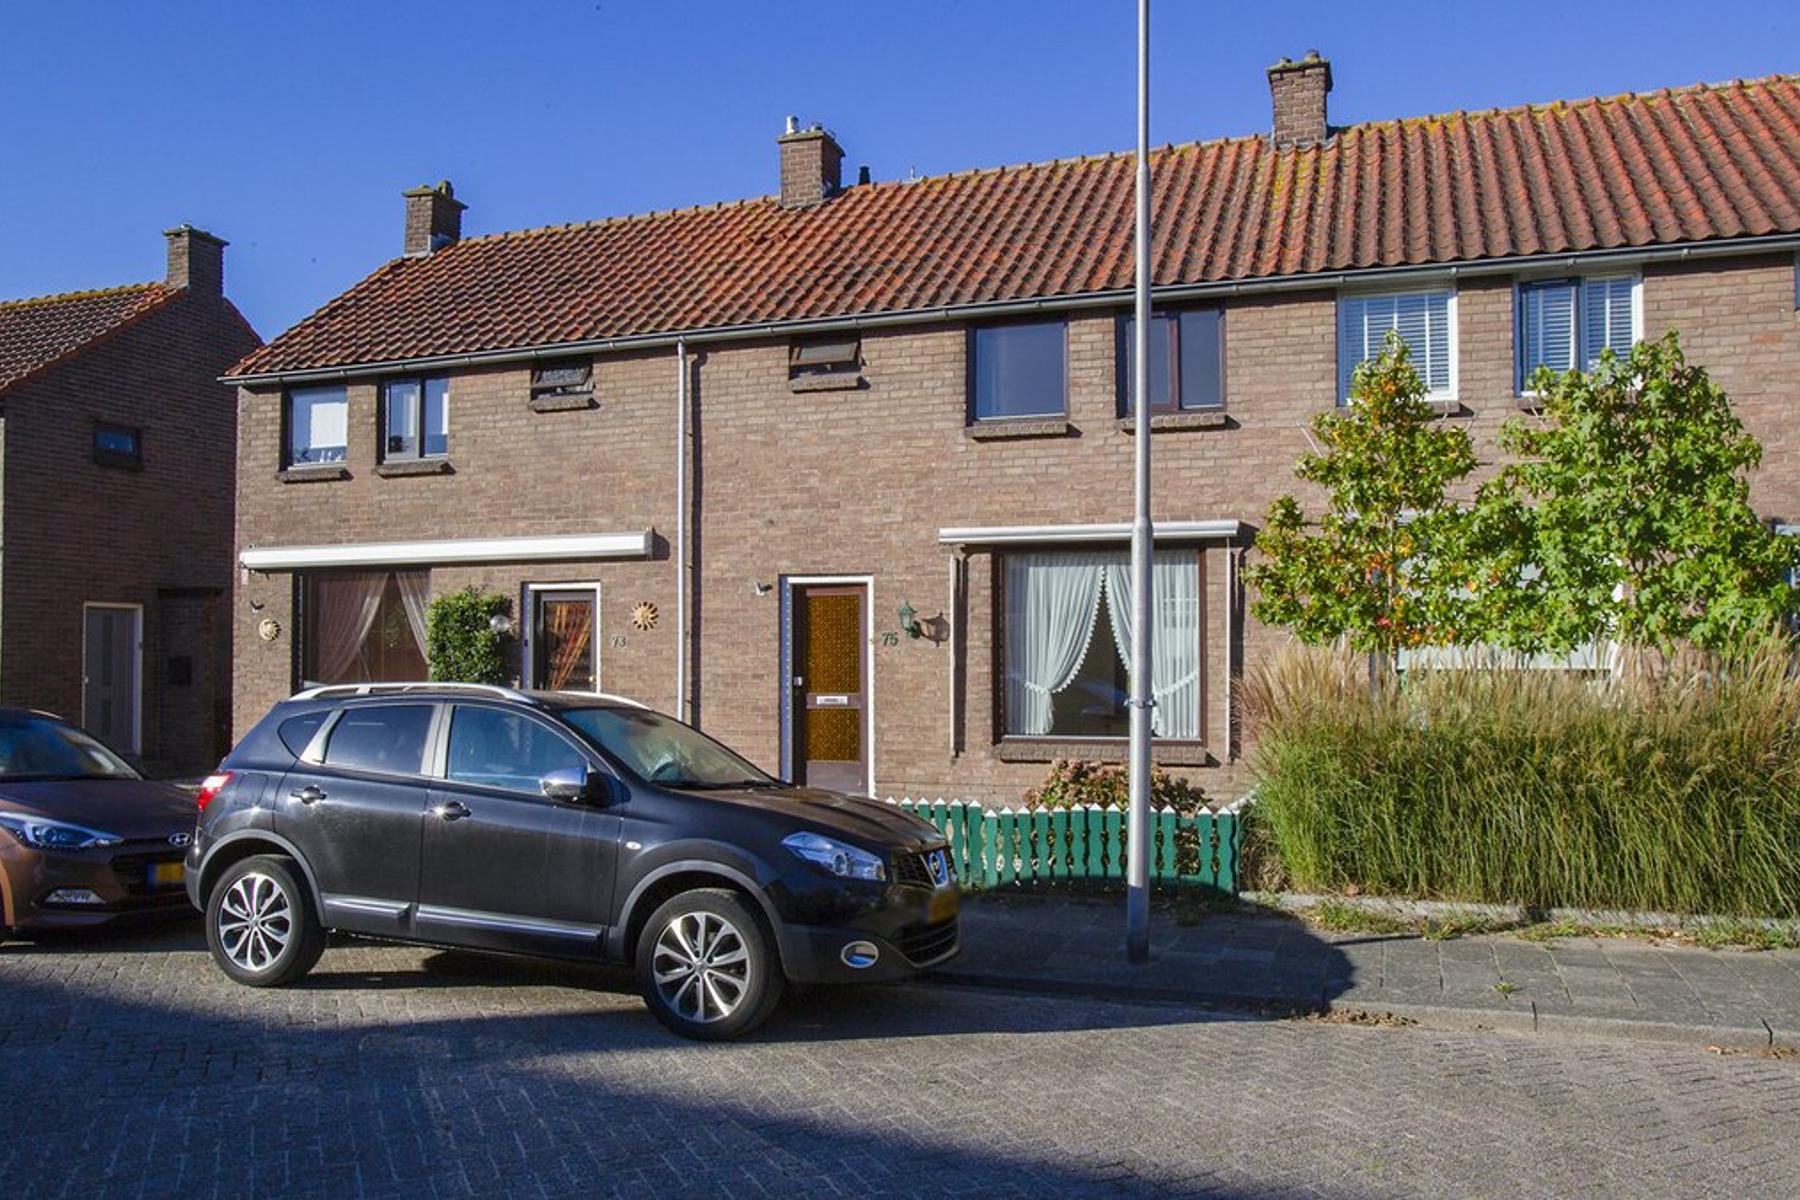 Mr. Heemskerkstraat 75 in Ridderkerk 2982 SH